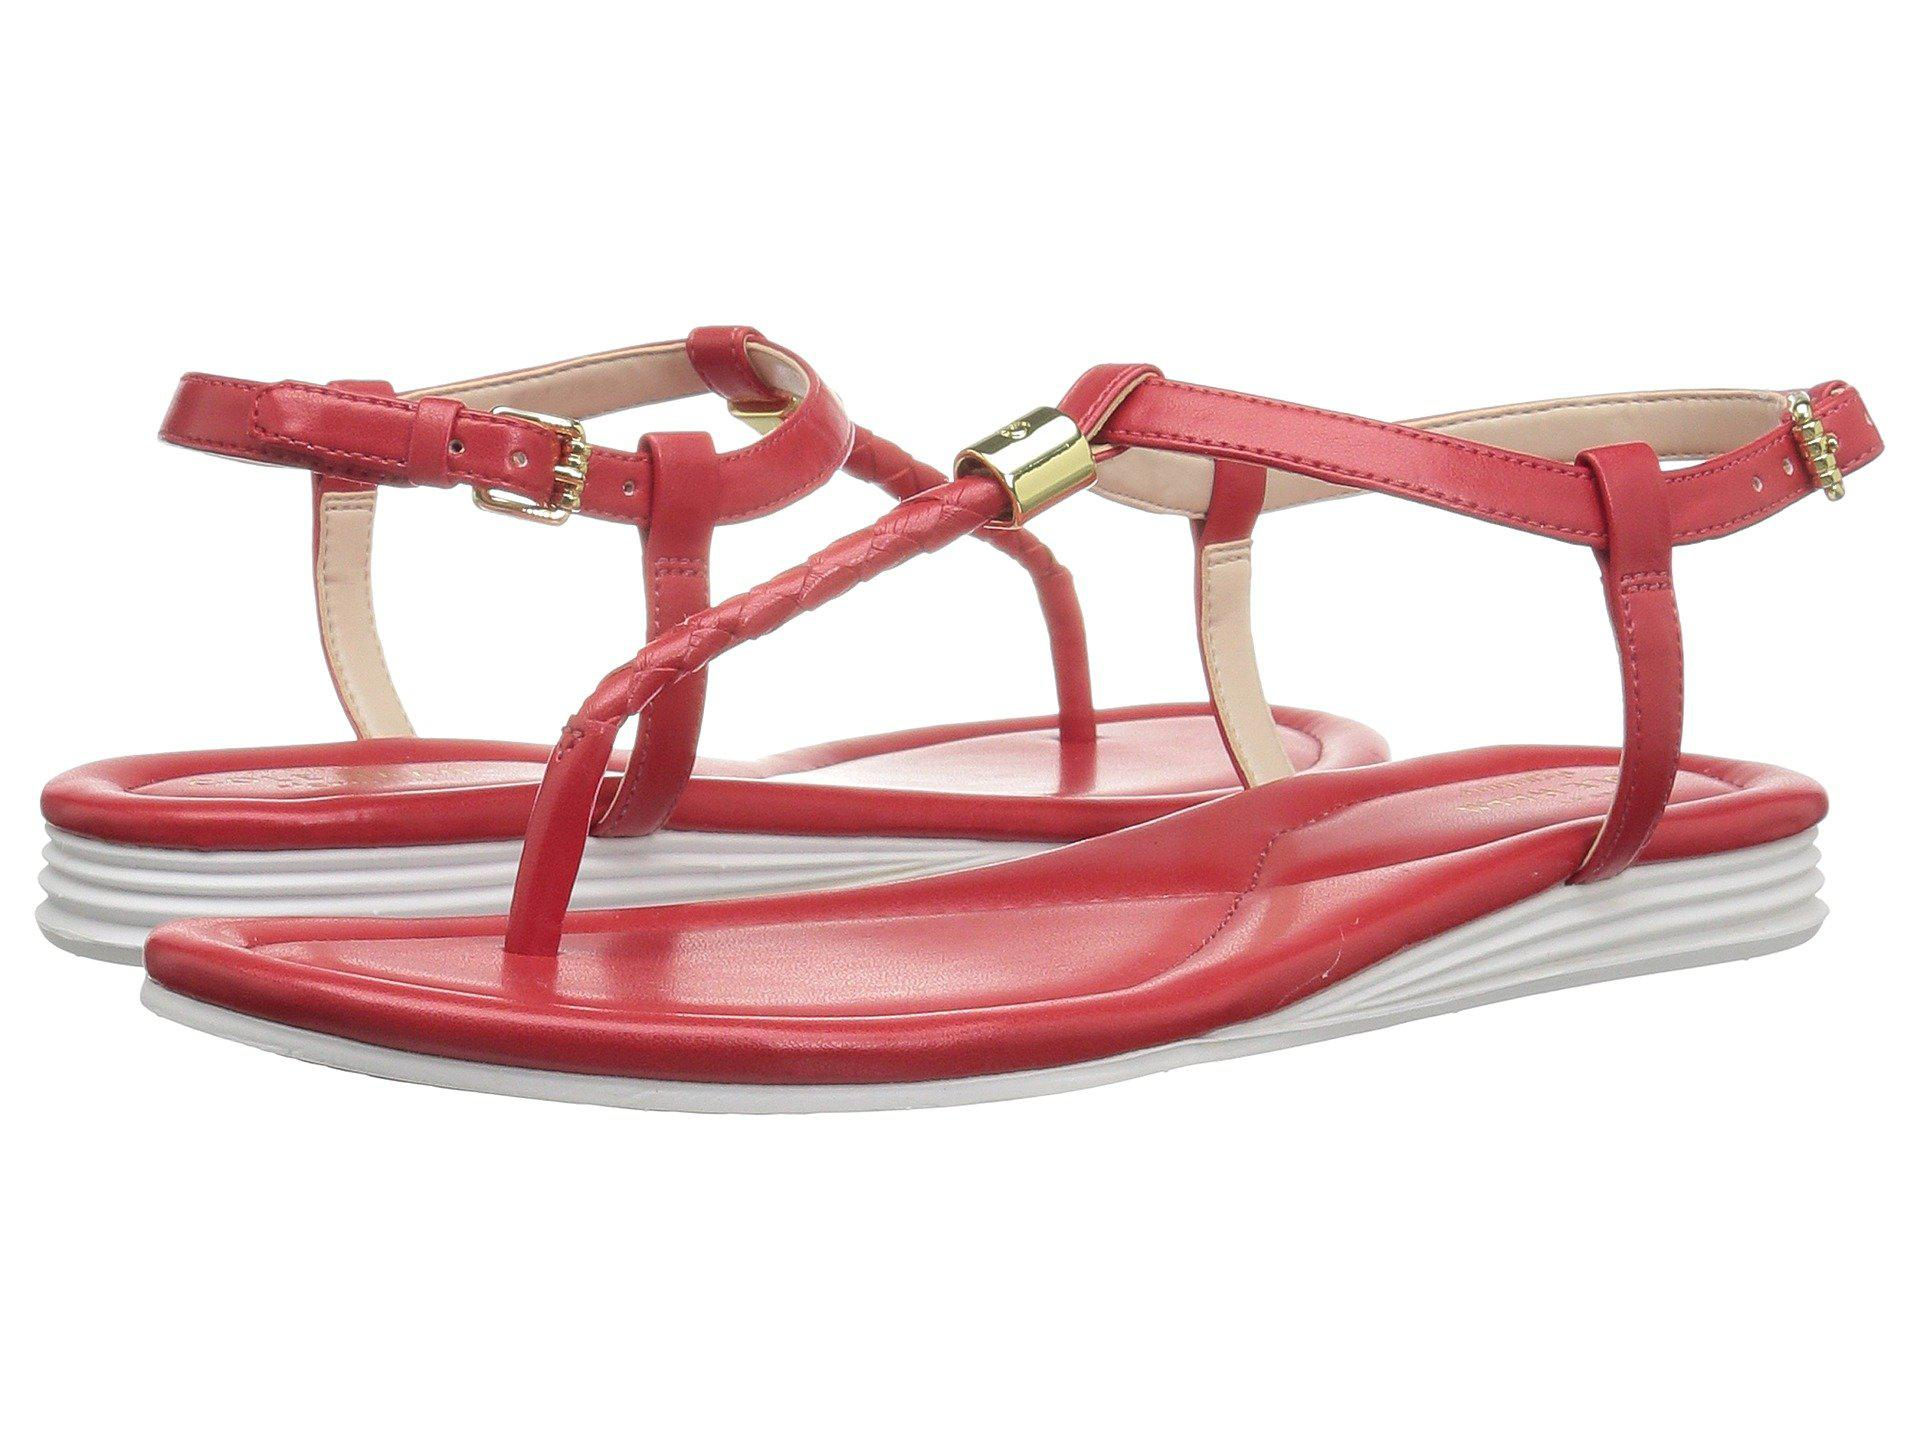 ebb80450597e Lyst - Cole Haan Original Grand Braid Sandal Ii